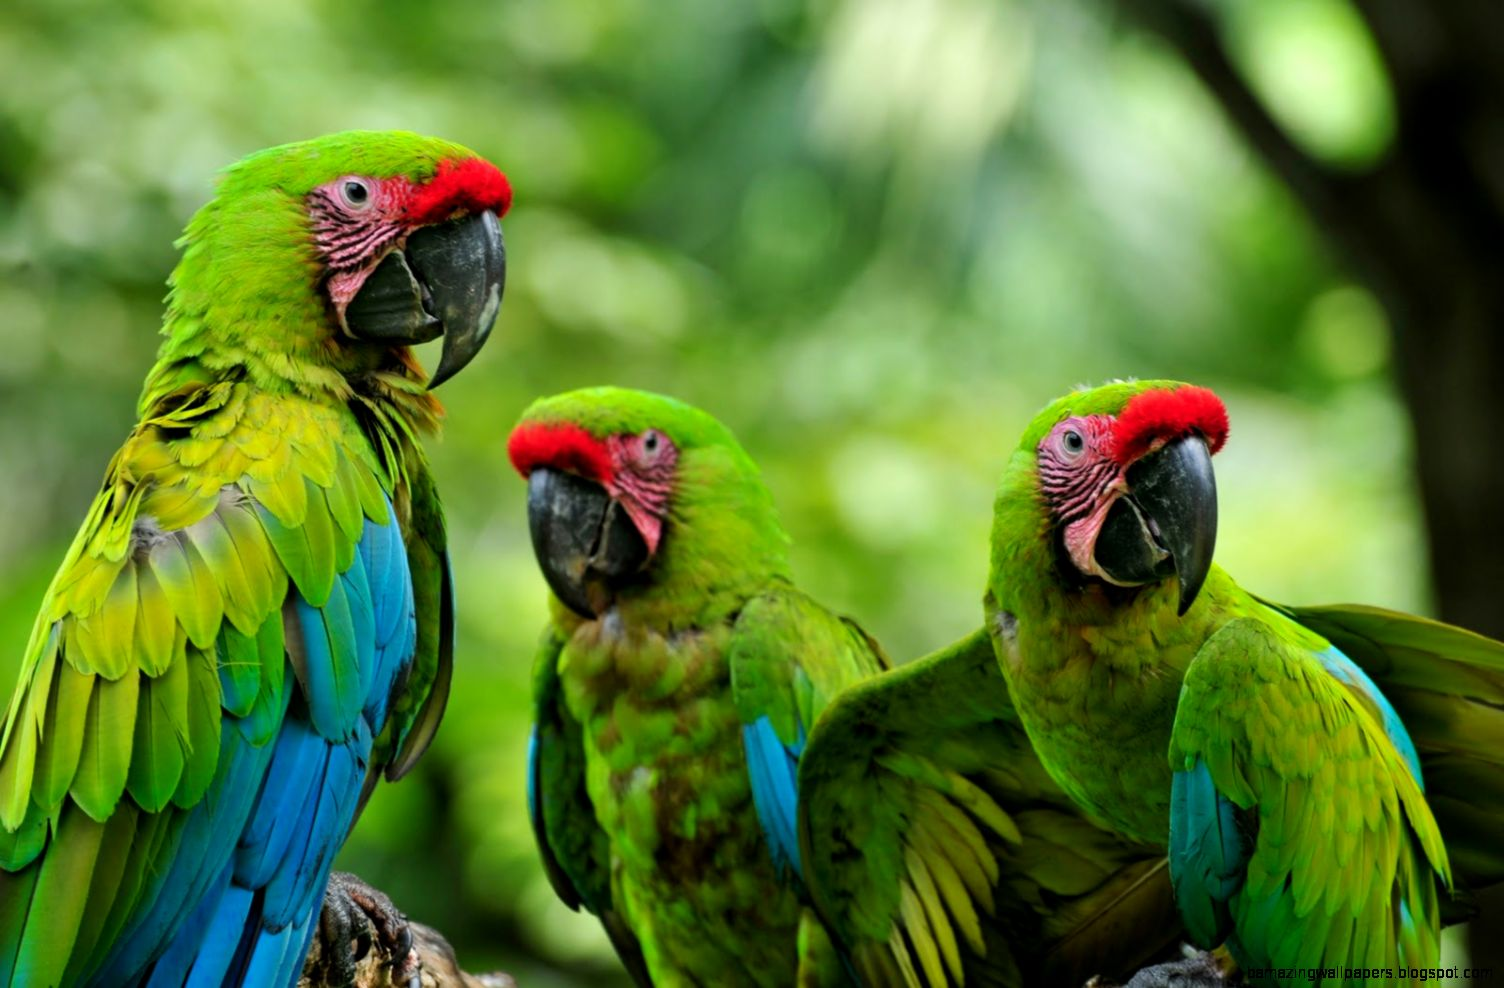 rainforest animals Rainforest guide rainforest animals - guide: amphibians poison dart frog red-eyed tree frog arthropods.